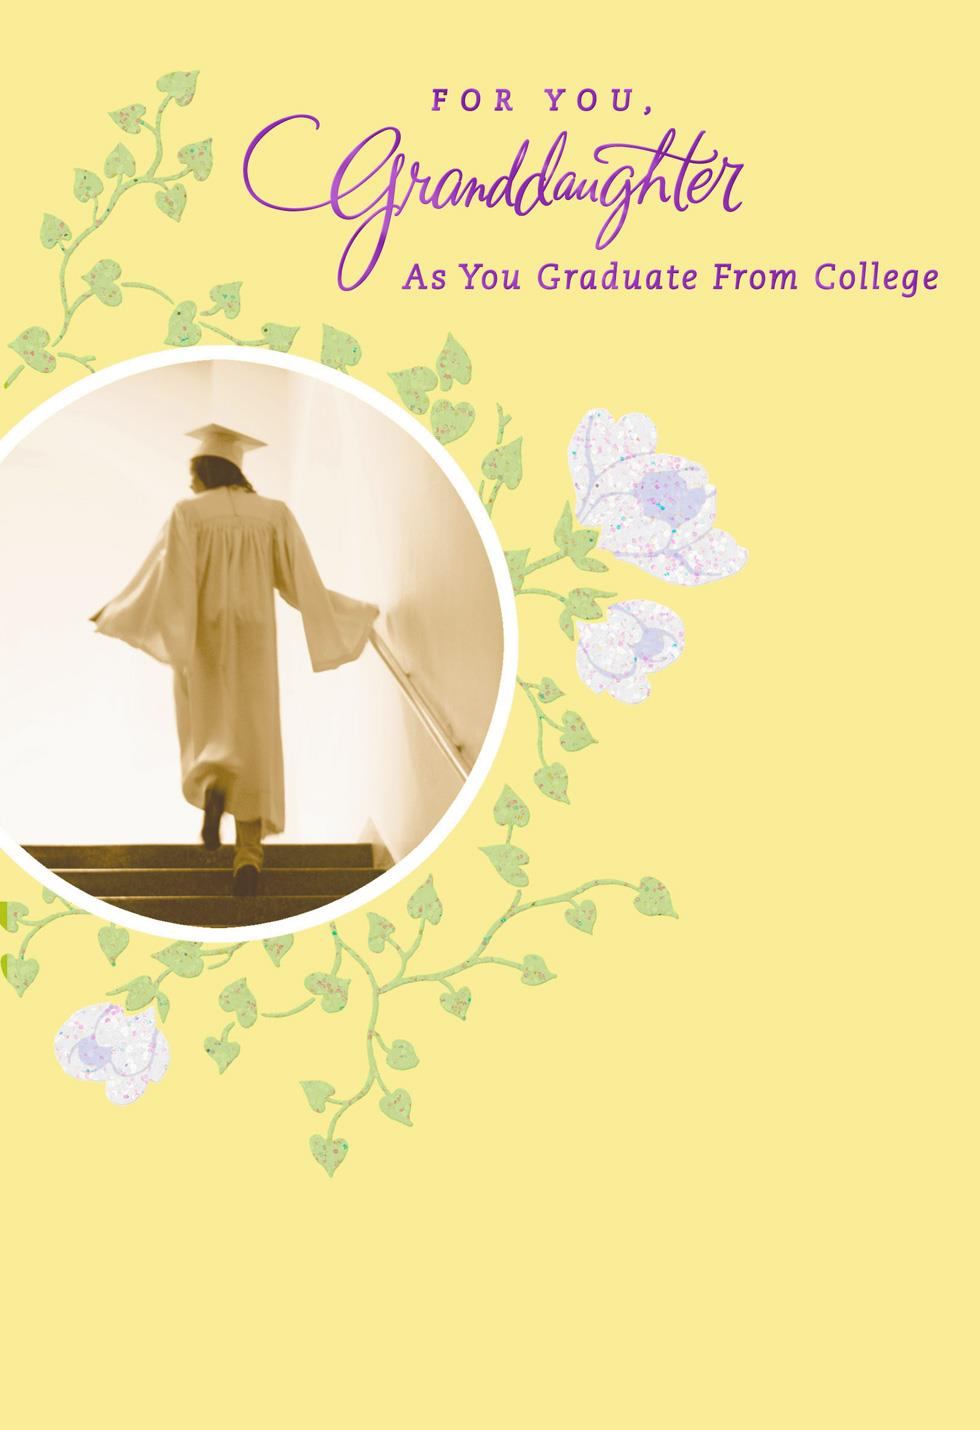 Forever Loved Granddaughter College Graduation Card